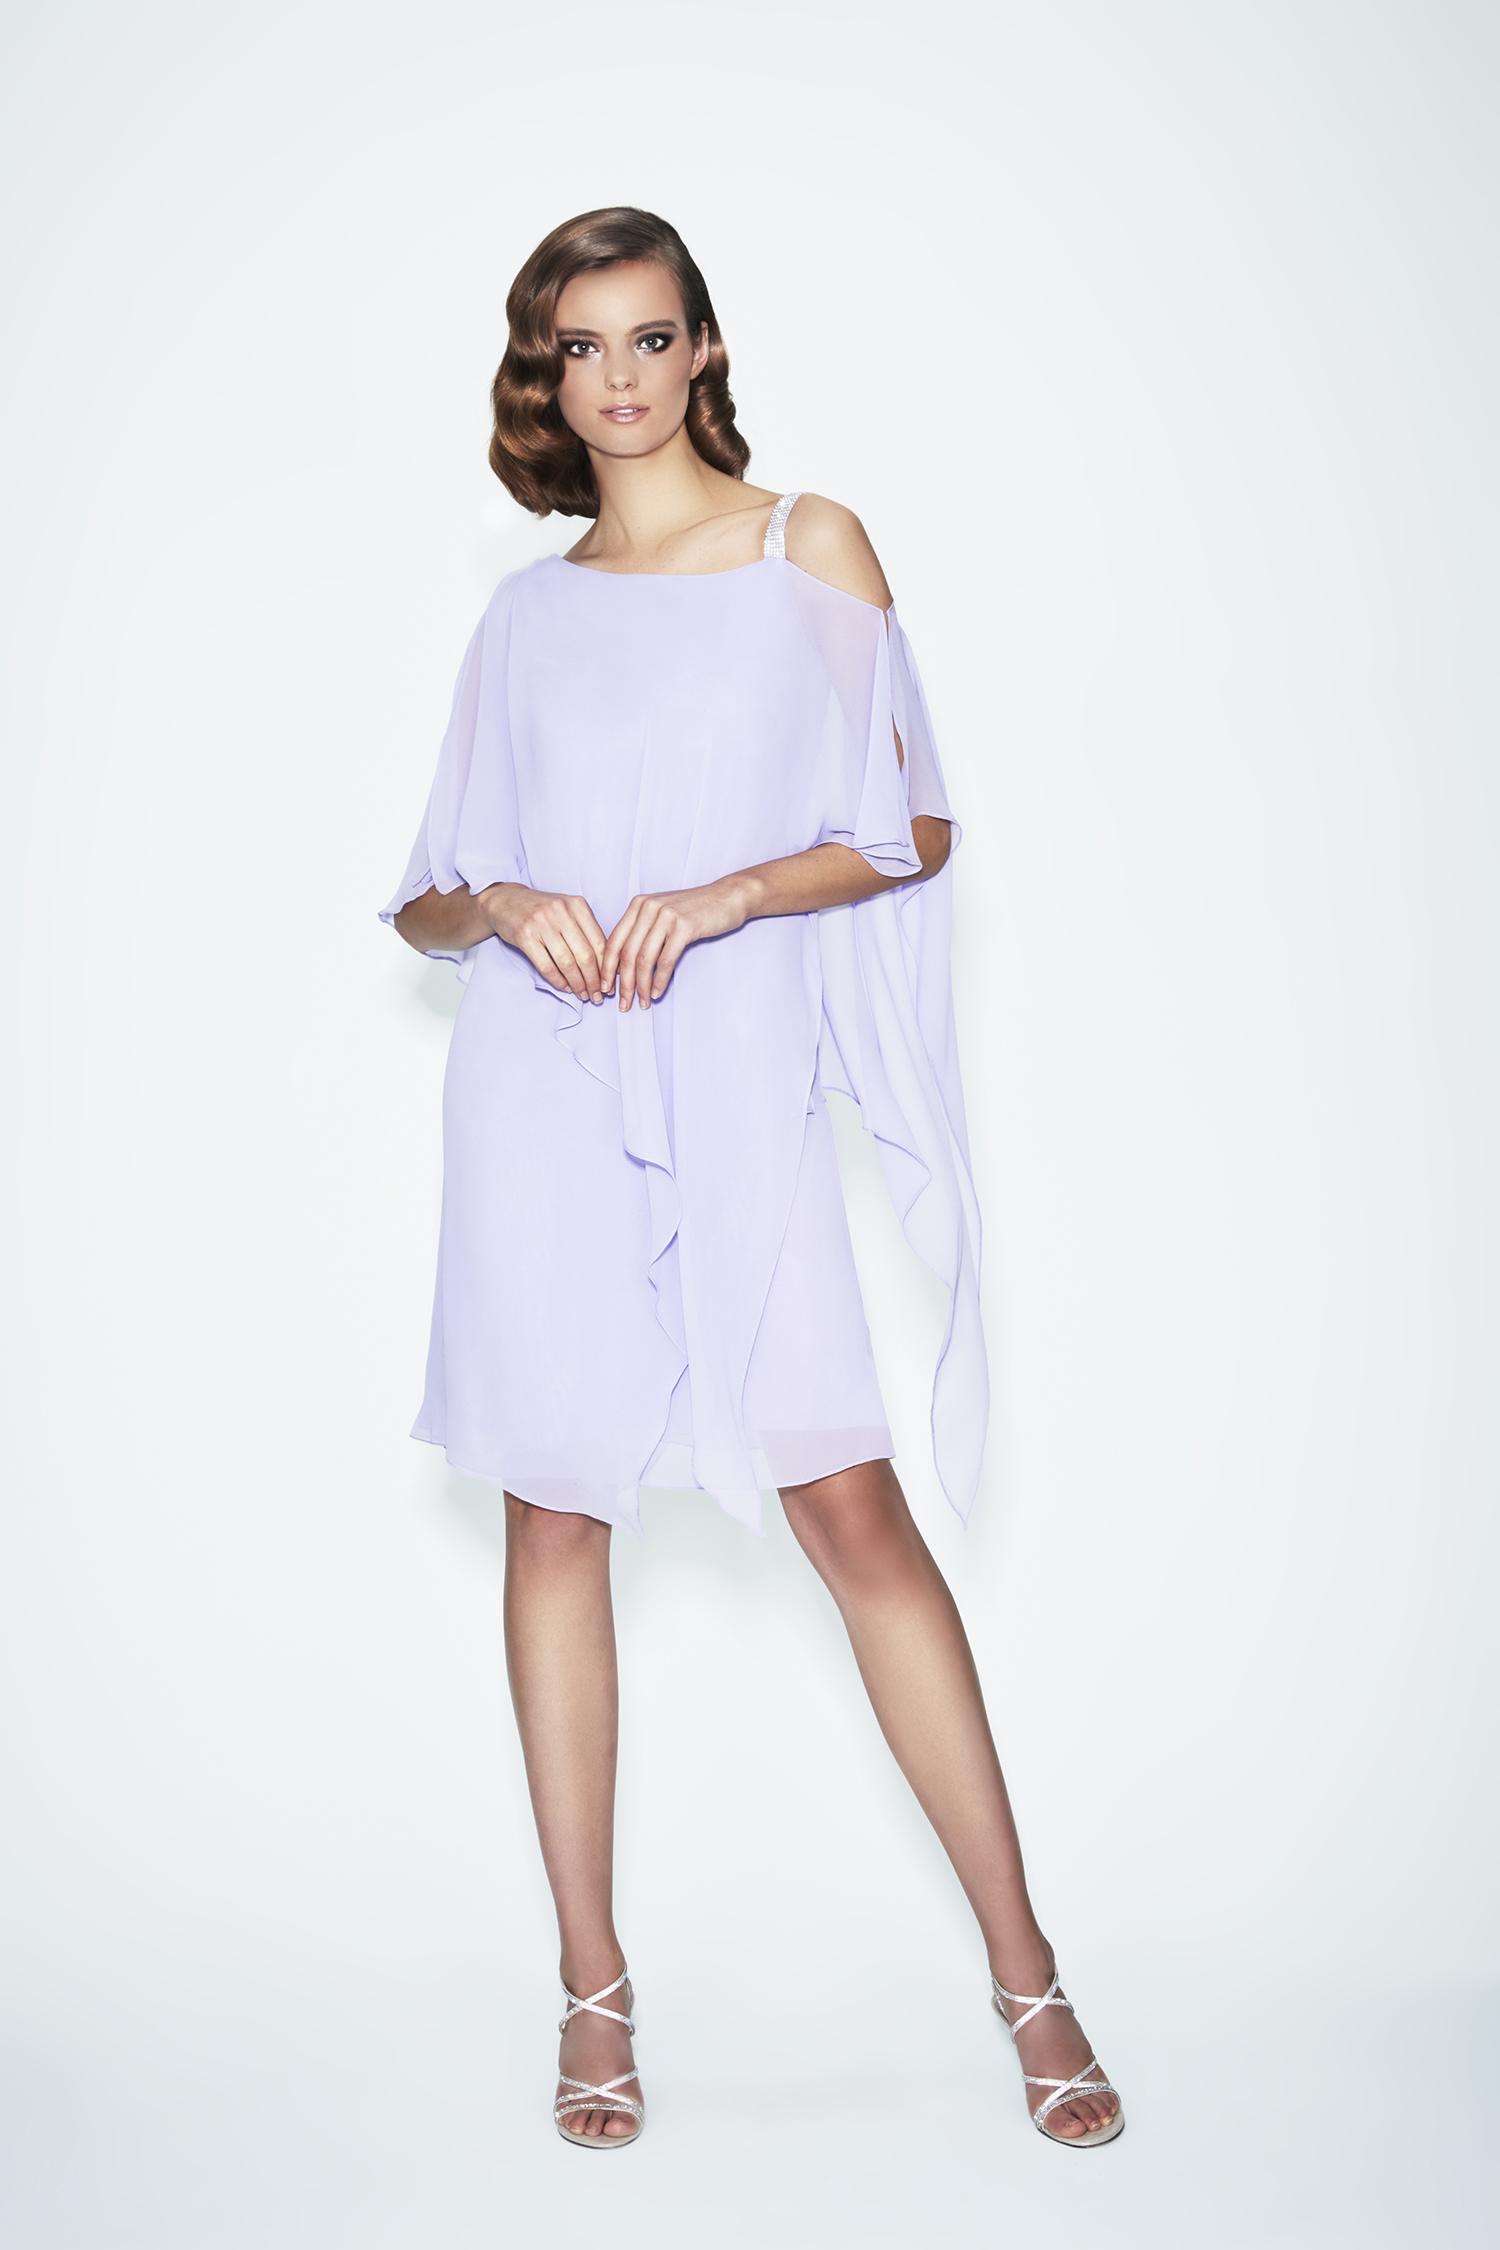 557-Lavender_008 RTCHD